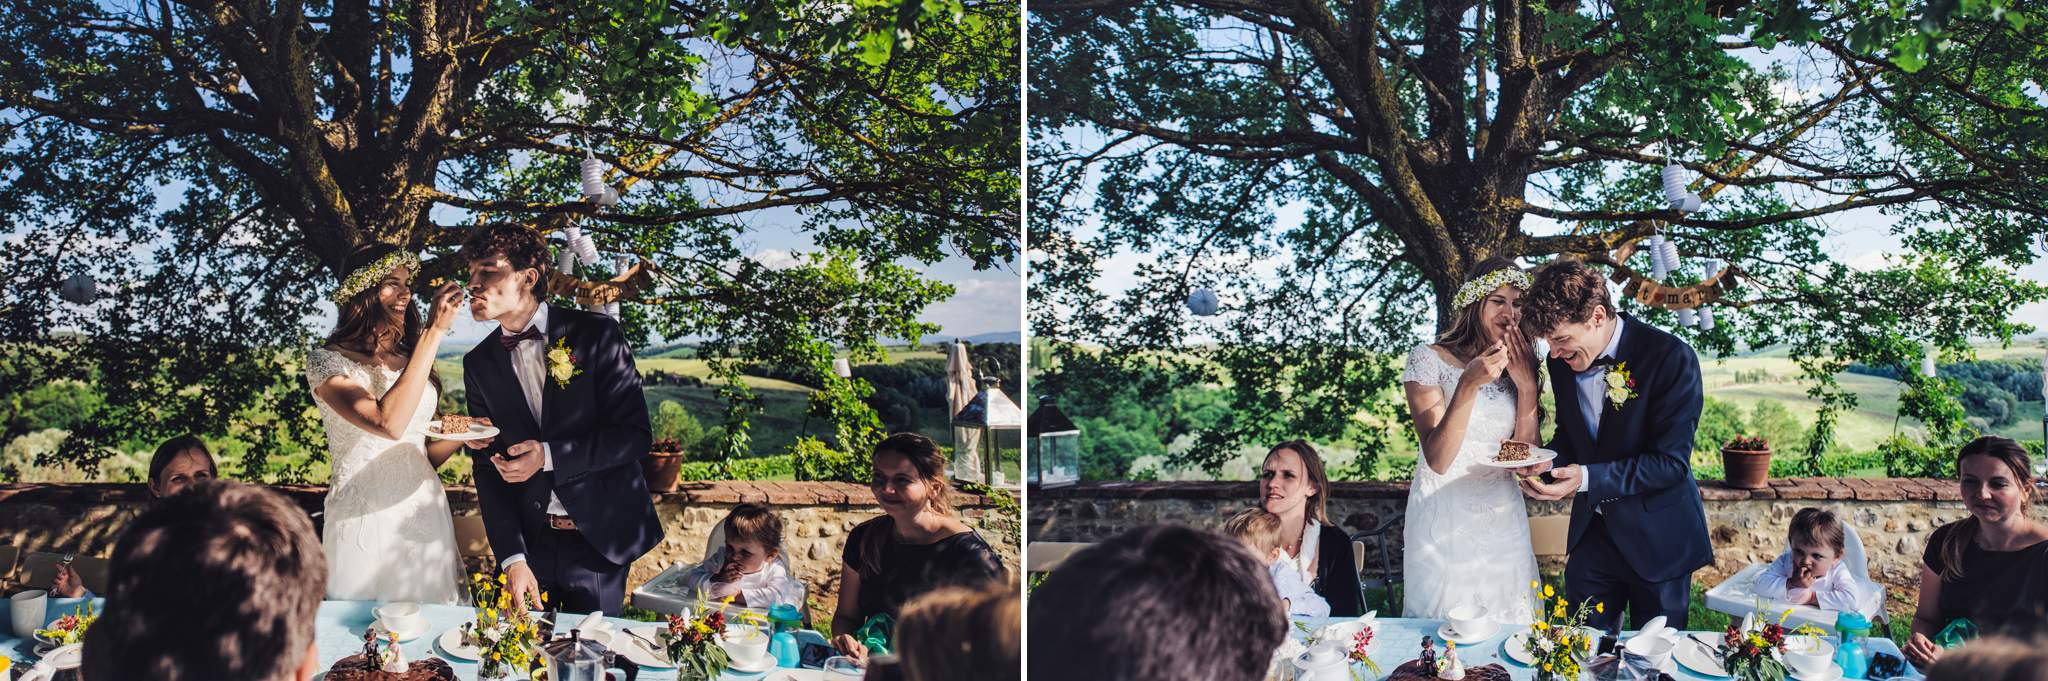 39wedding-photographer-tuscany-siena